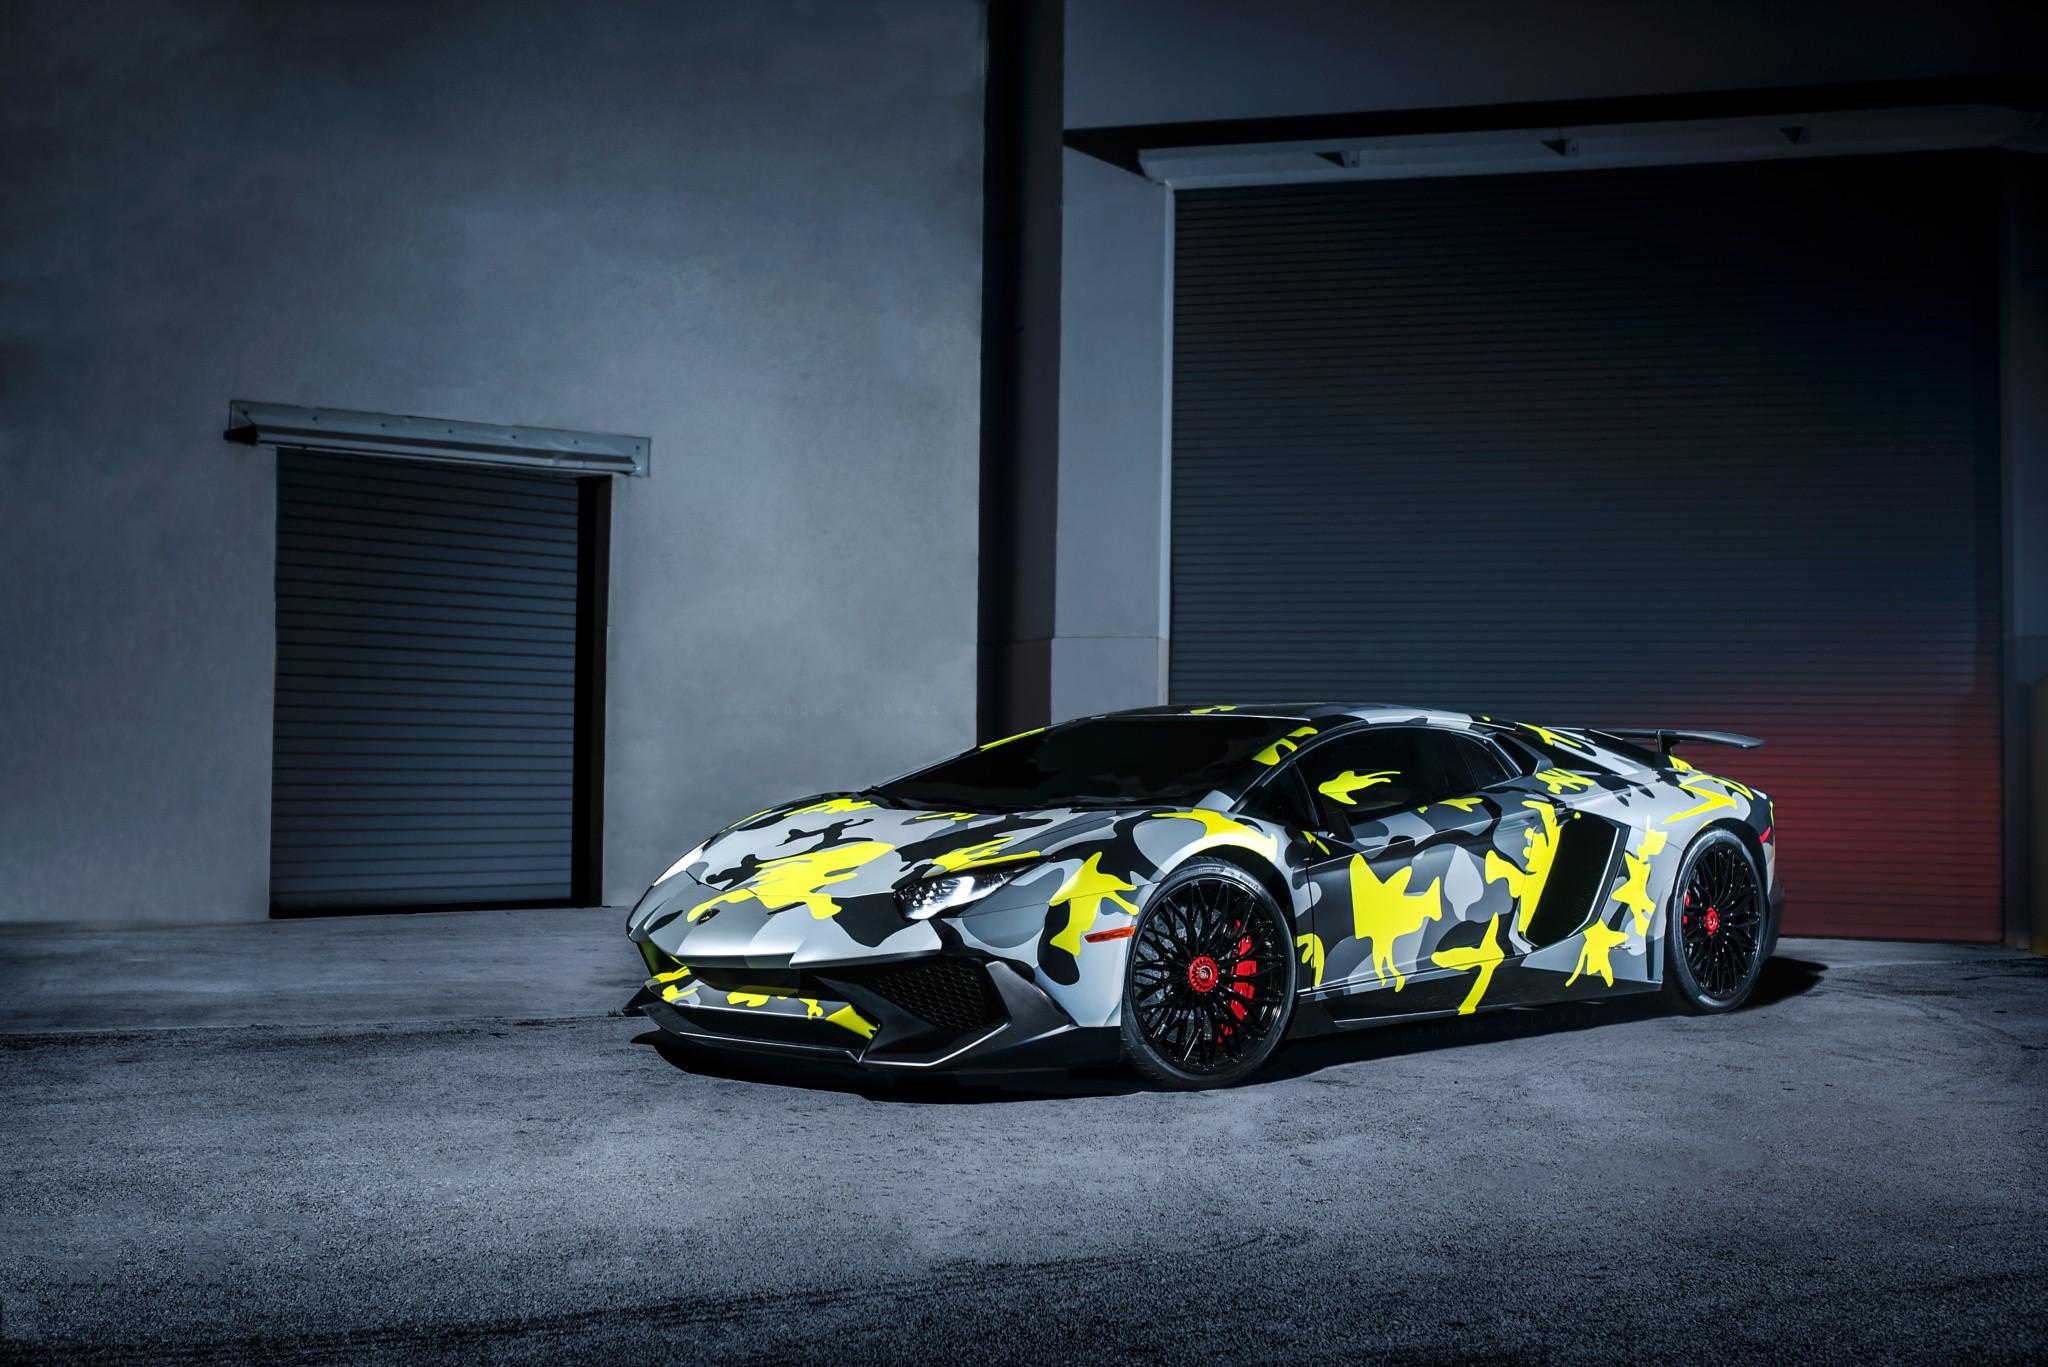 Wallpapers Autos Hd: Lamborghini Aventador Modified, HD Cars, 4k Wallpapers